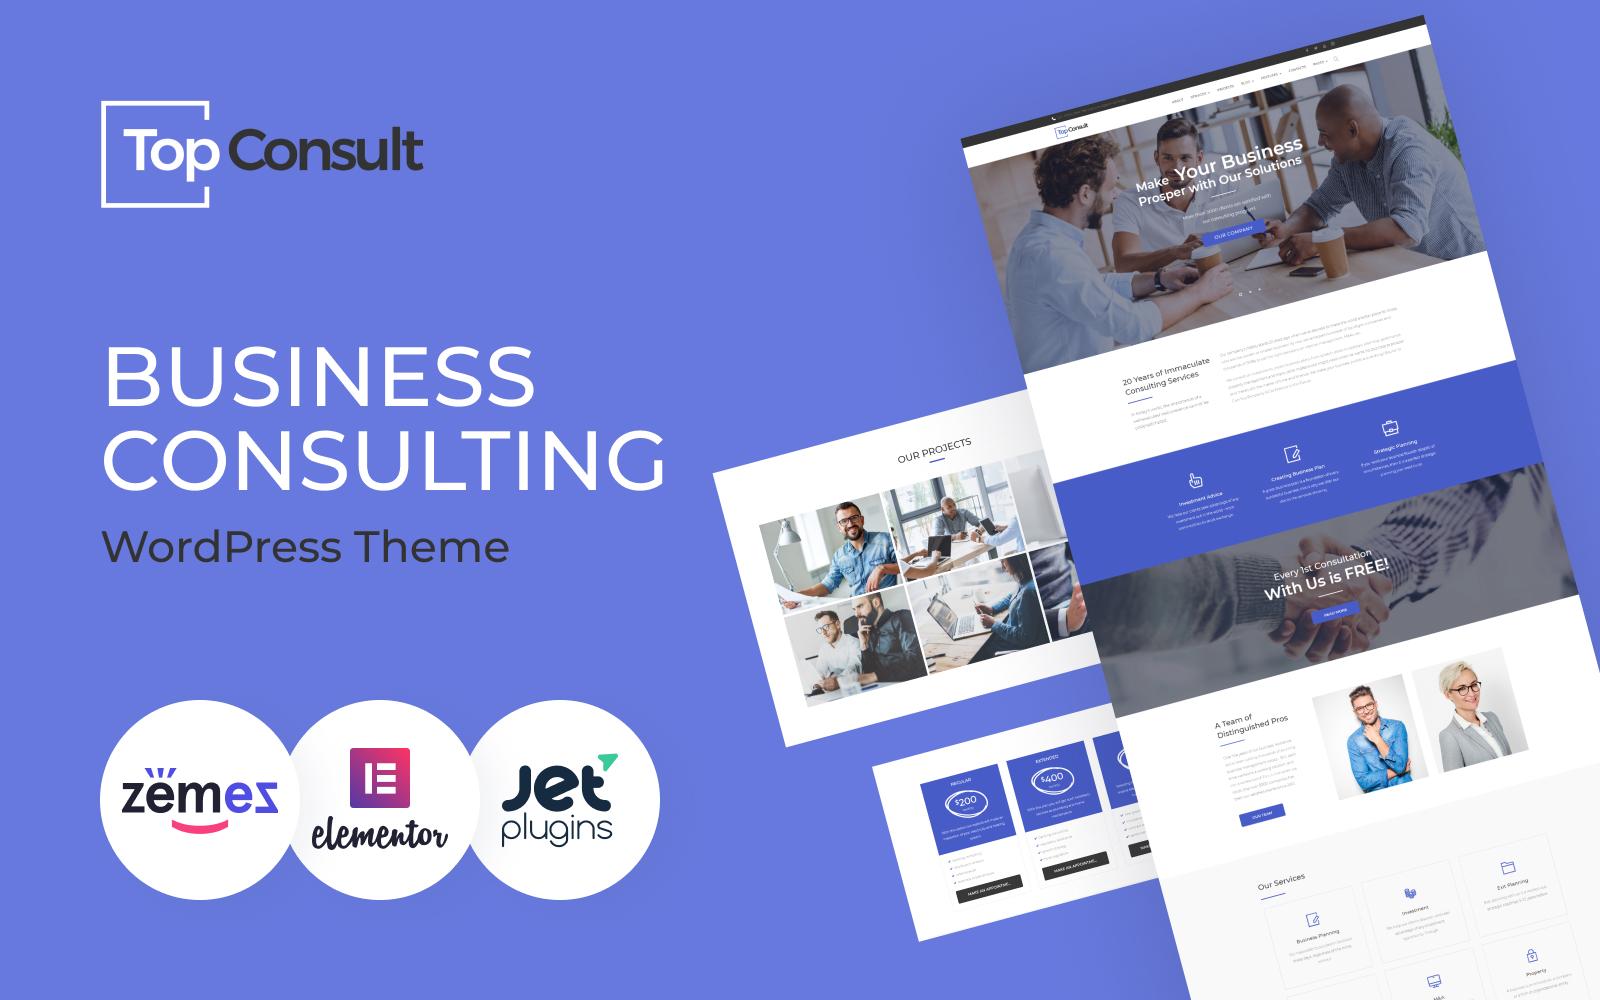 Reszponzív TopConsult - Business Consulting WordPress Theme WordPress sablon 65484